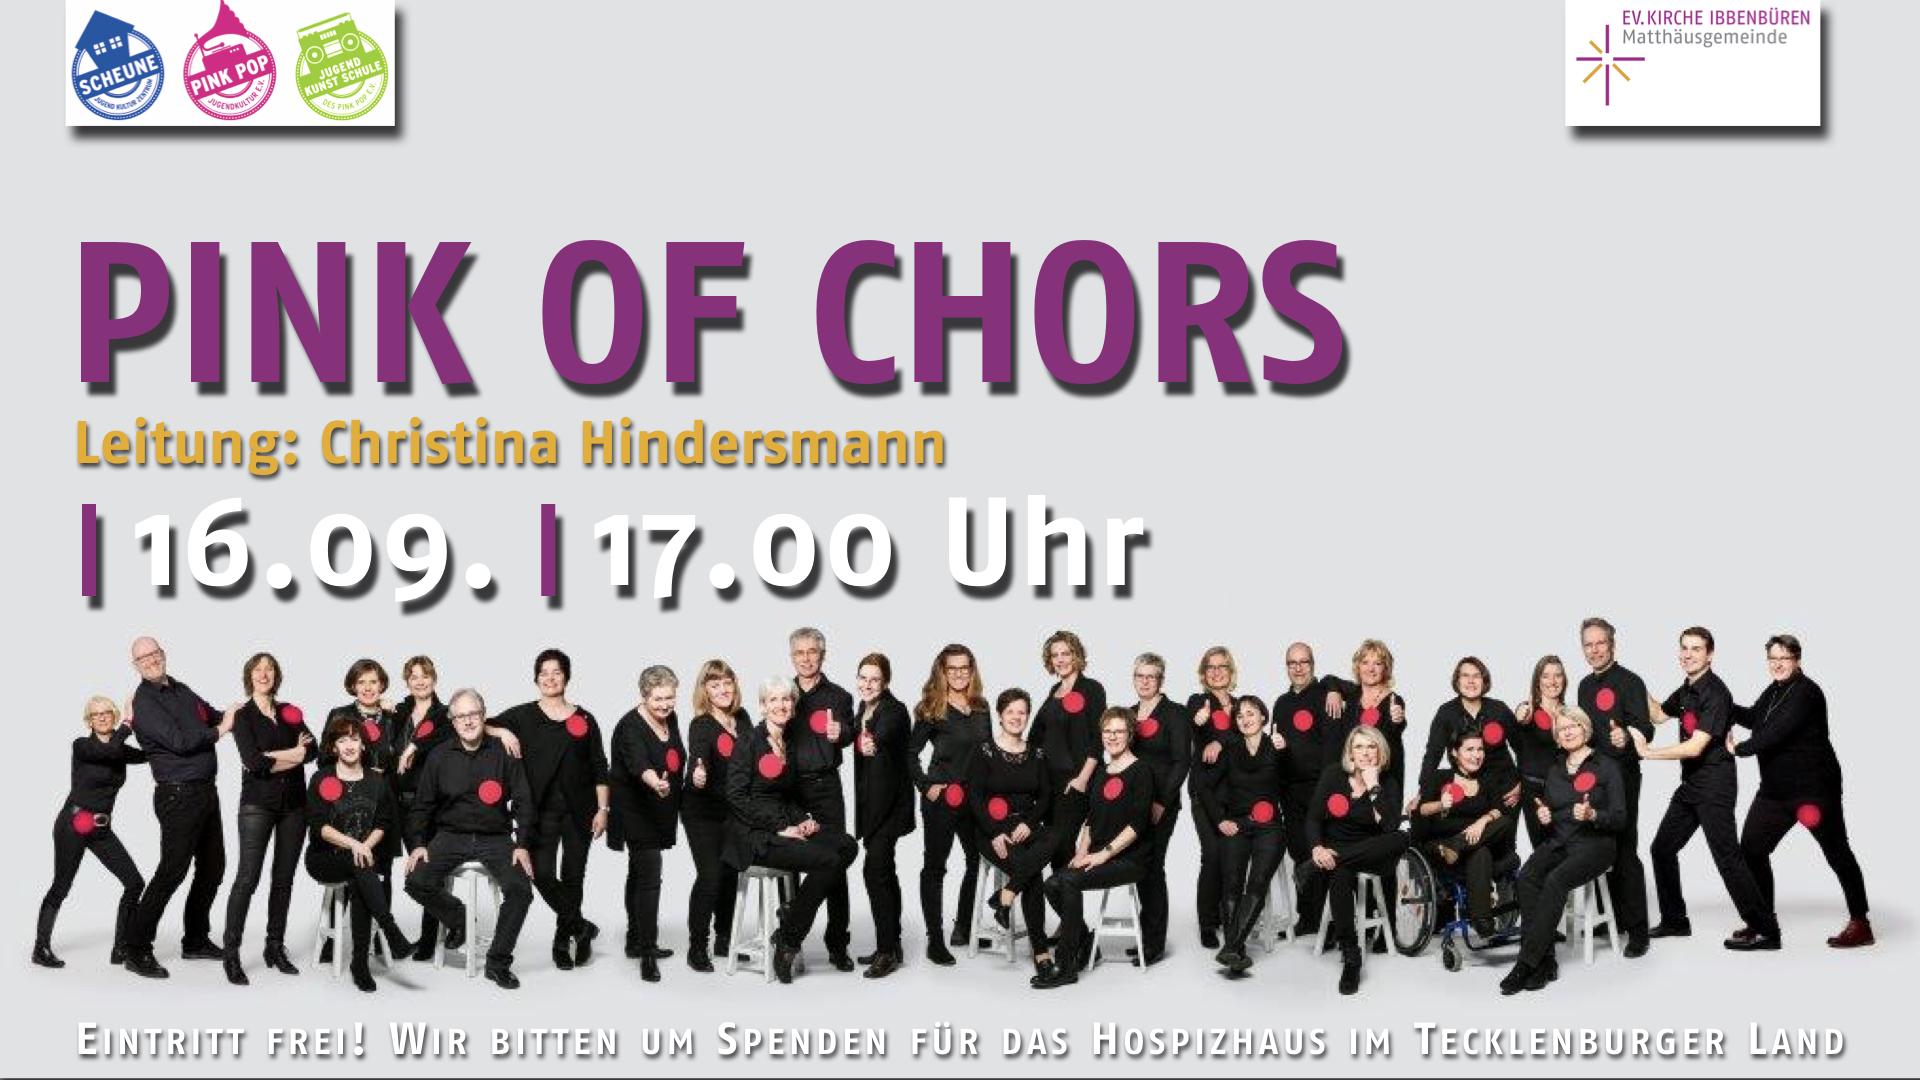 20180916_PoC Plakat 1920x1080 Schaukasten